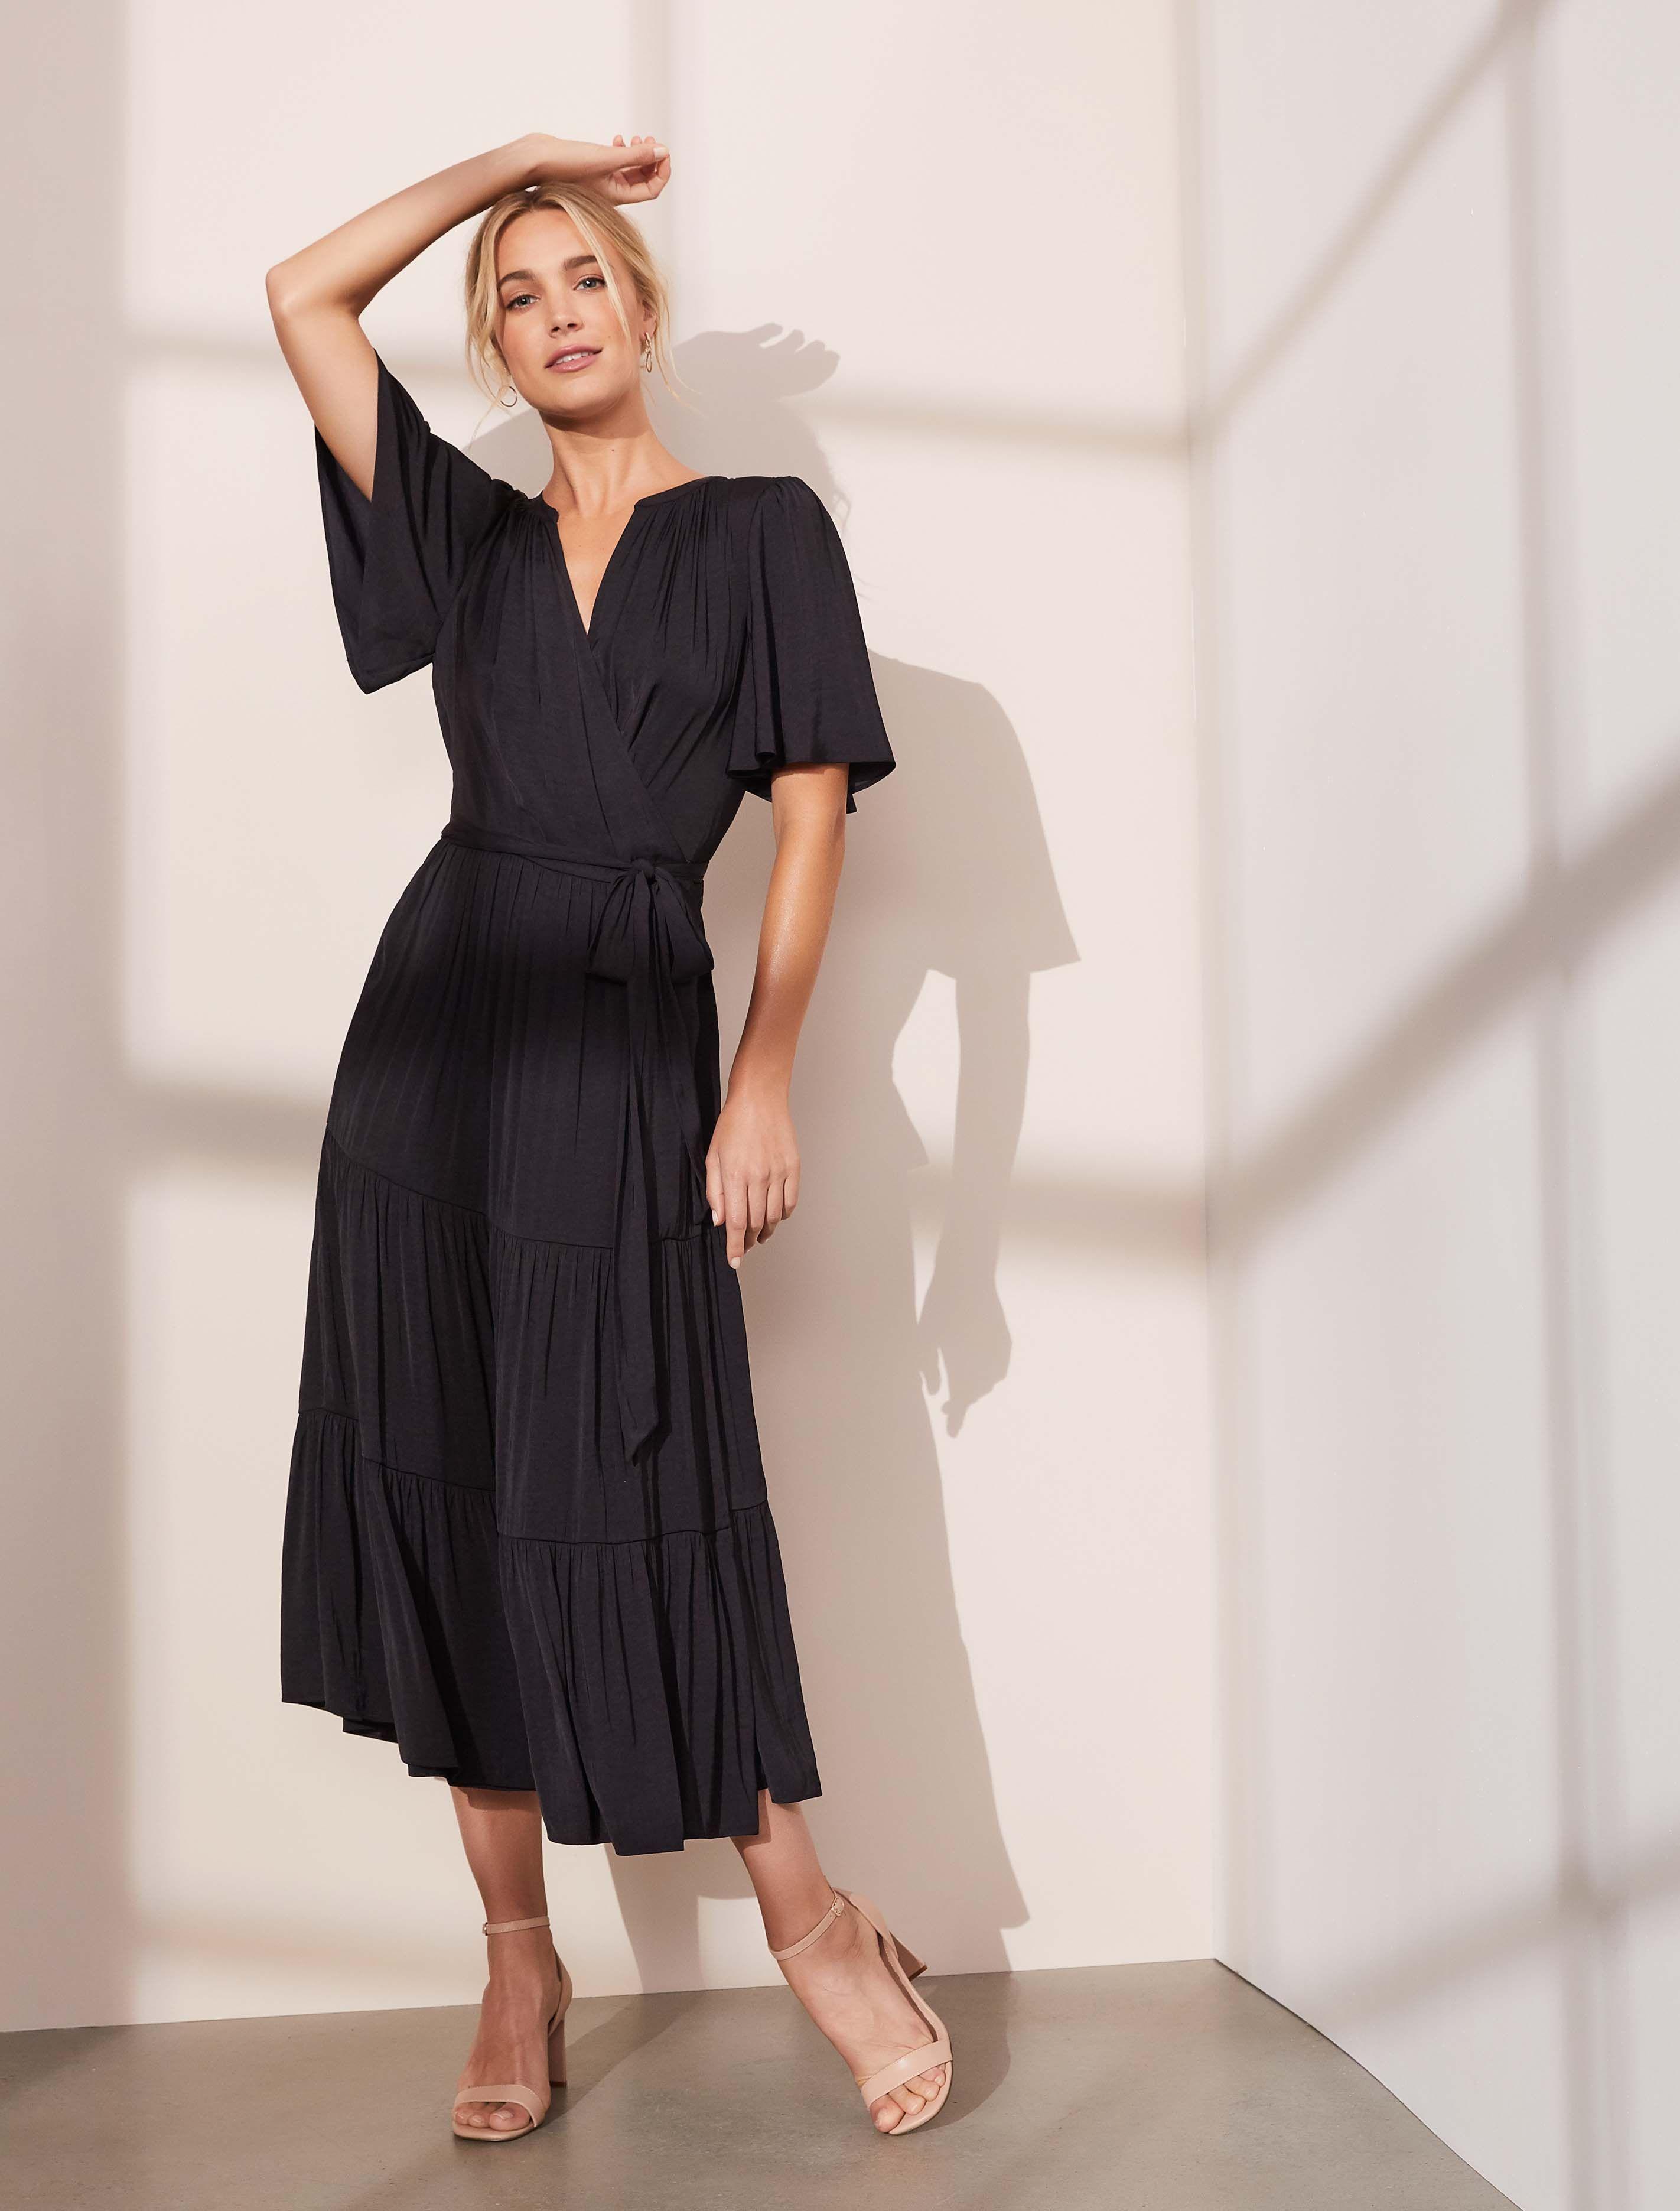 Anna Flutter Sleeve Midi Dress Women S Fashion Forever New Midi Dress With Sleeves Womens Midi Dresses Dresses [ 3742 x 2844 Pixel ]